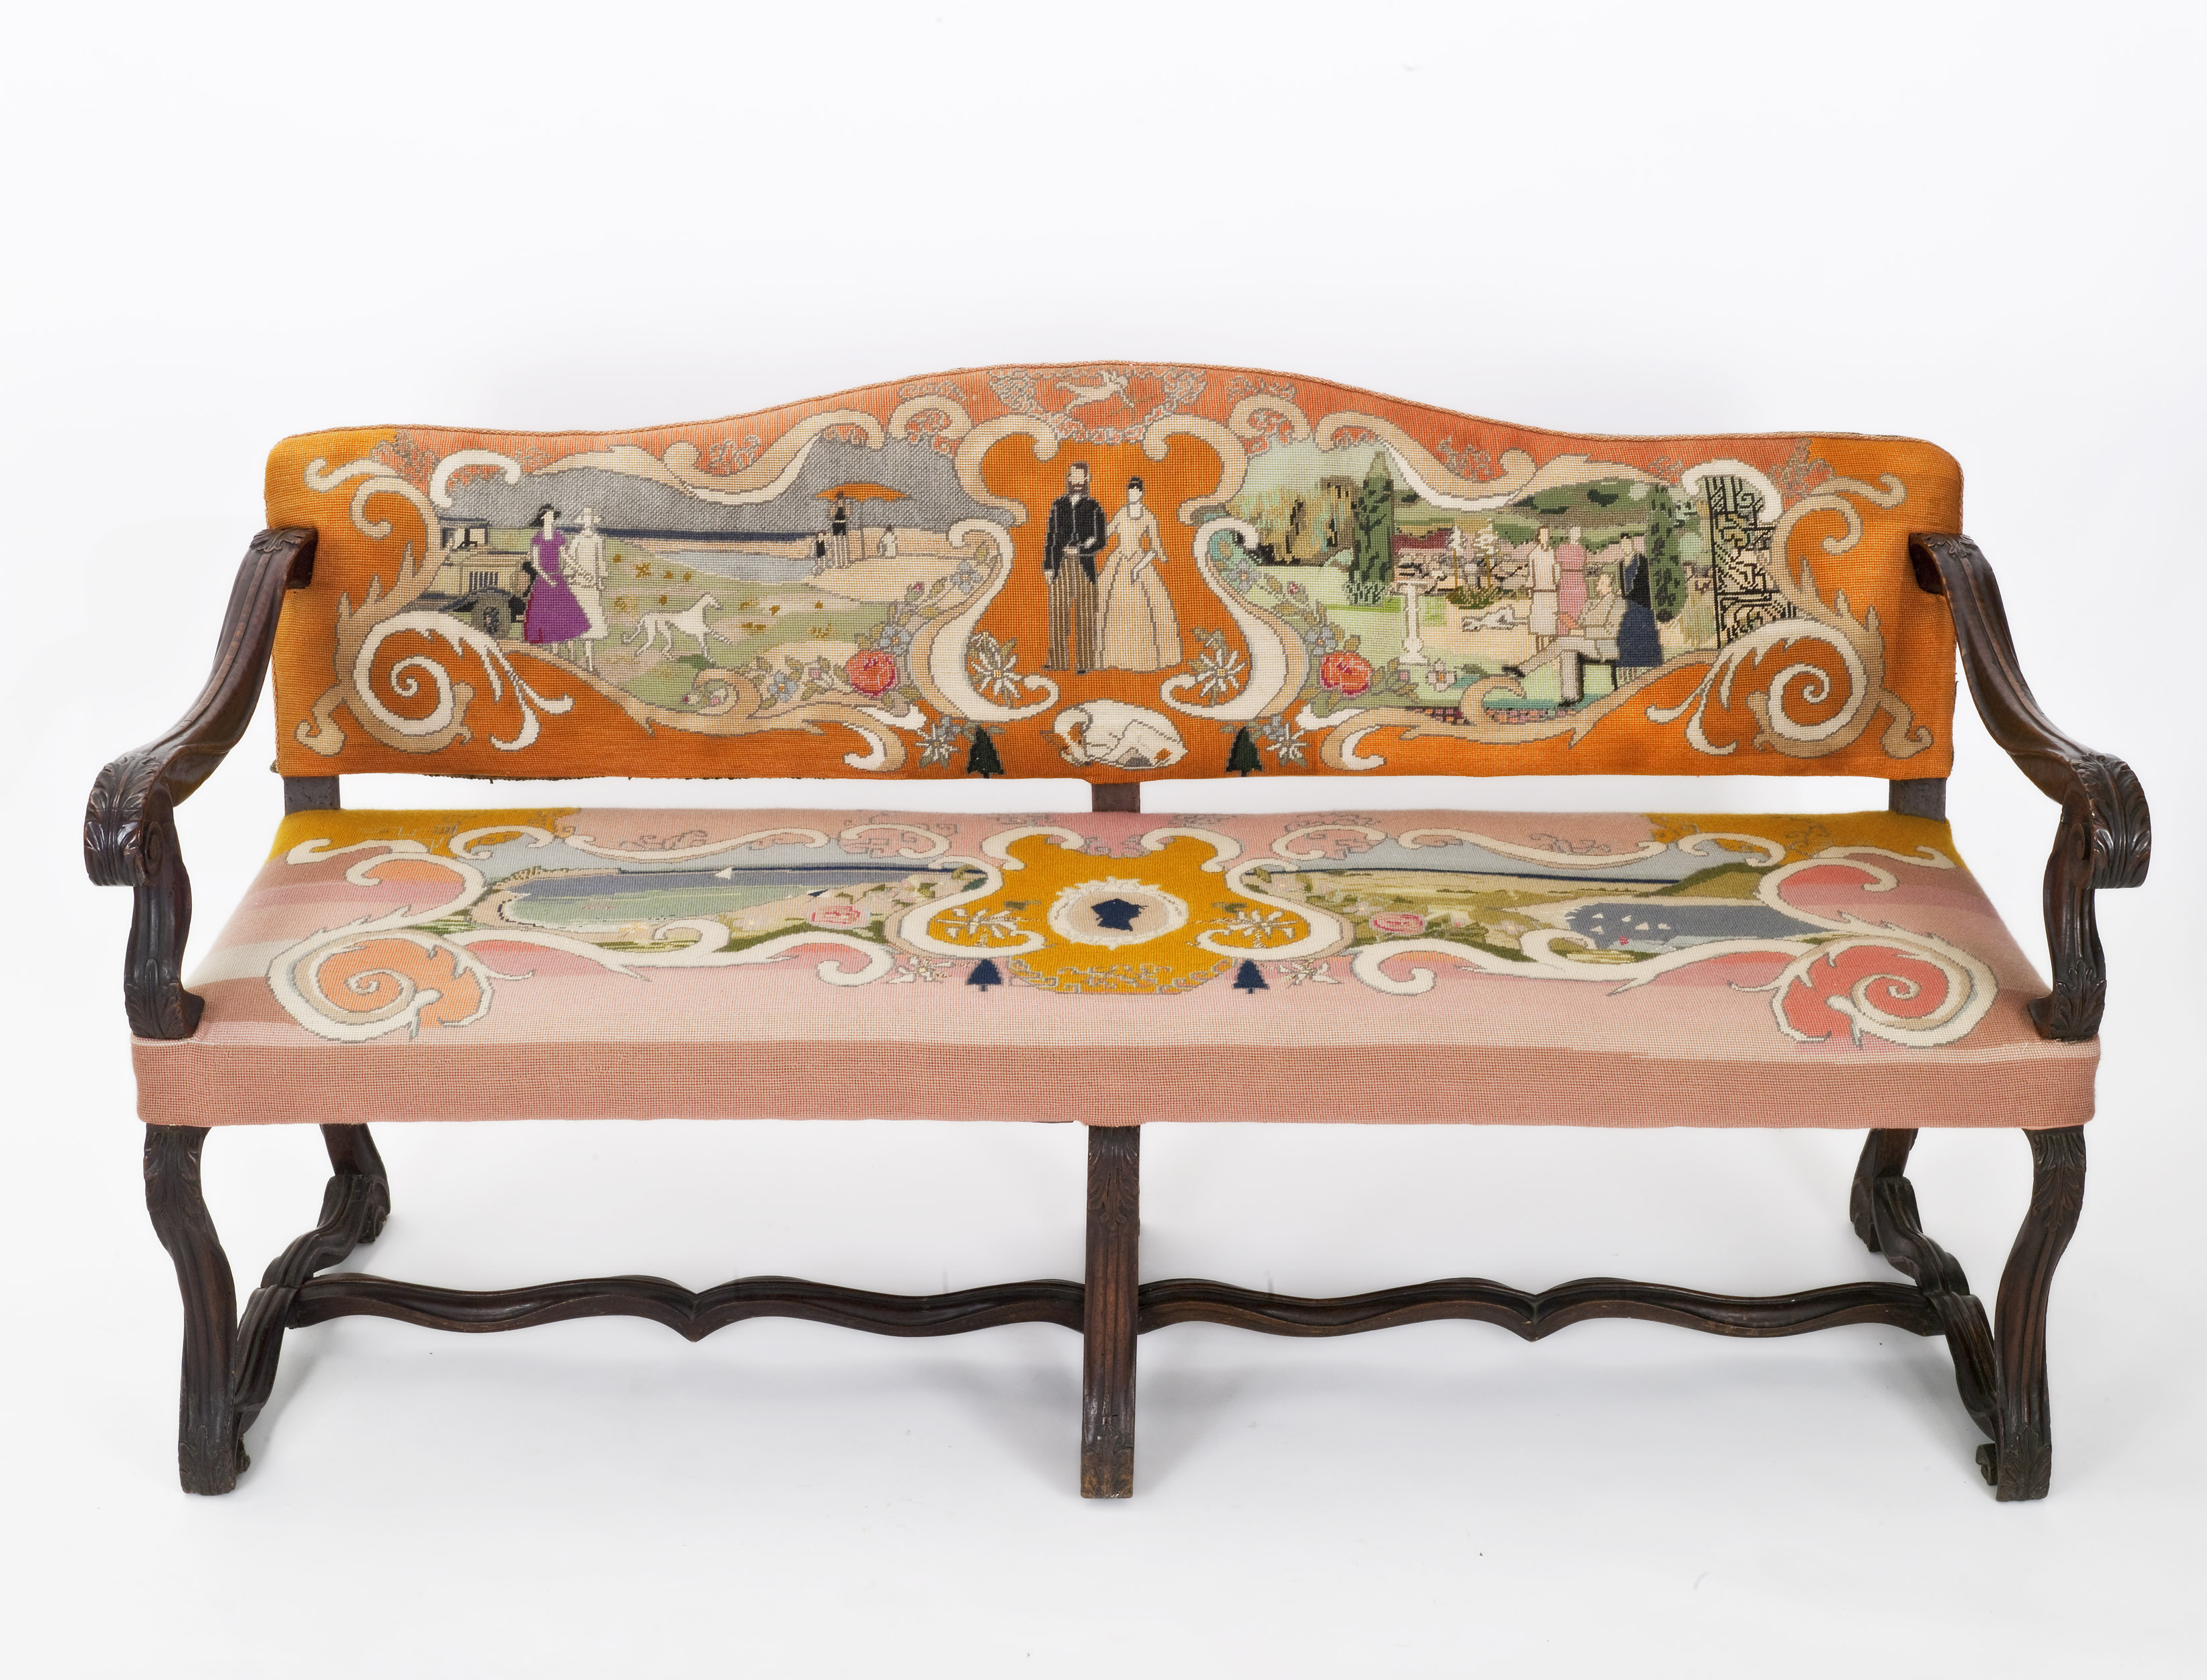 NHA_Italian Settee with Canvaswork Upholstery